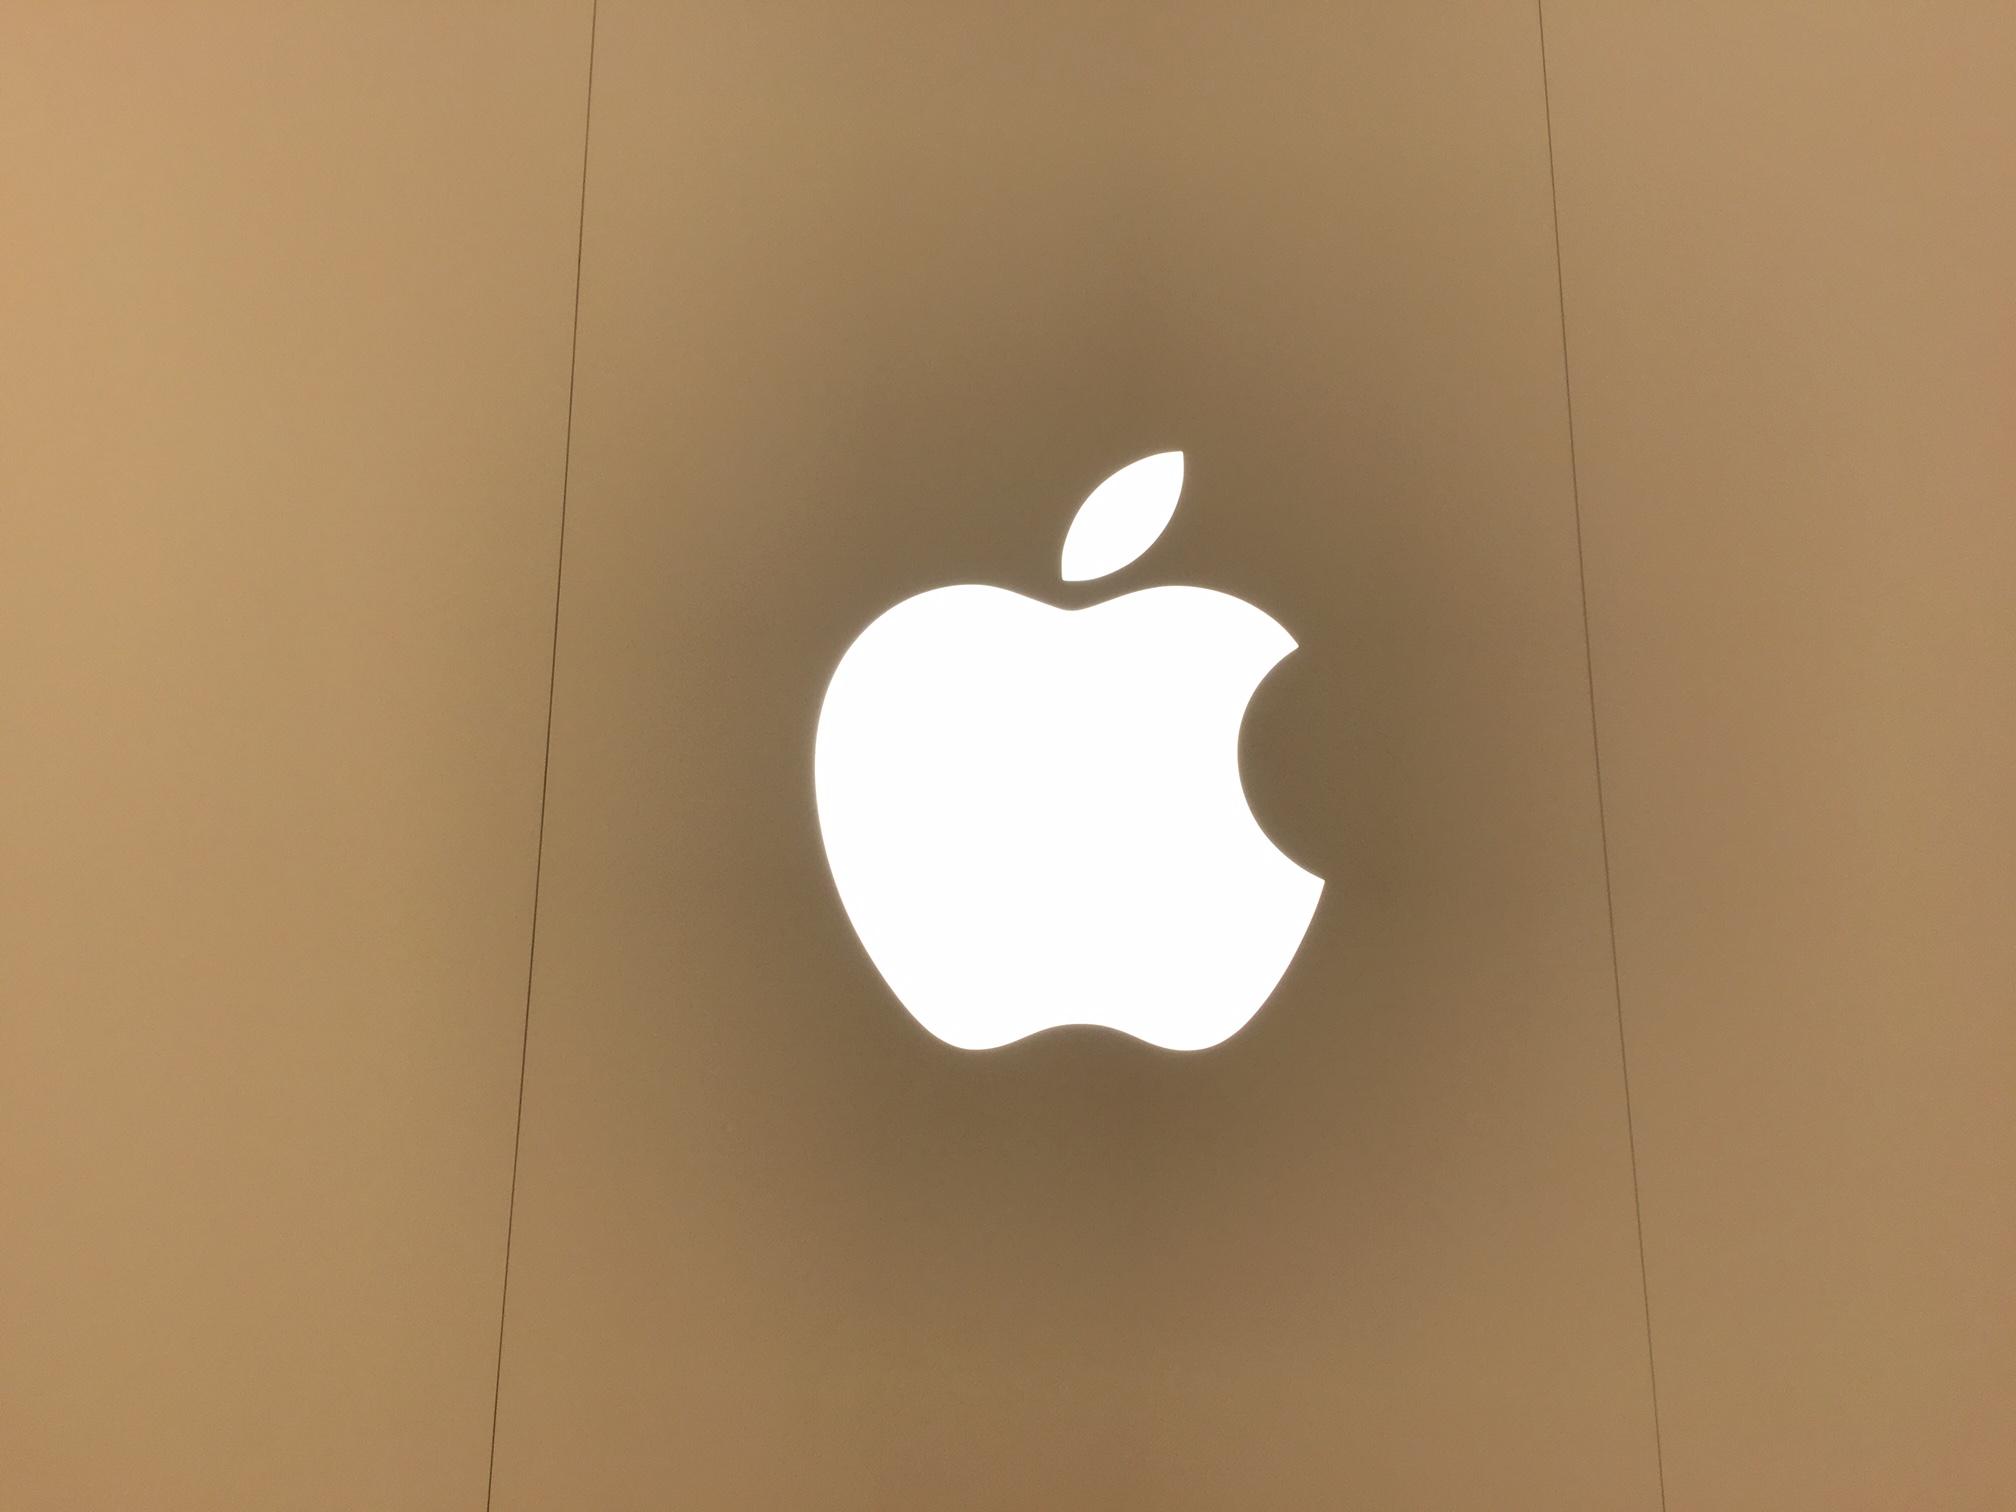 iPhone降速爭議 蘋果宣布提供電池折扣與軟體更新